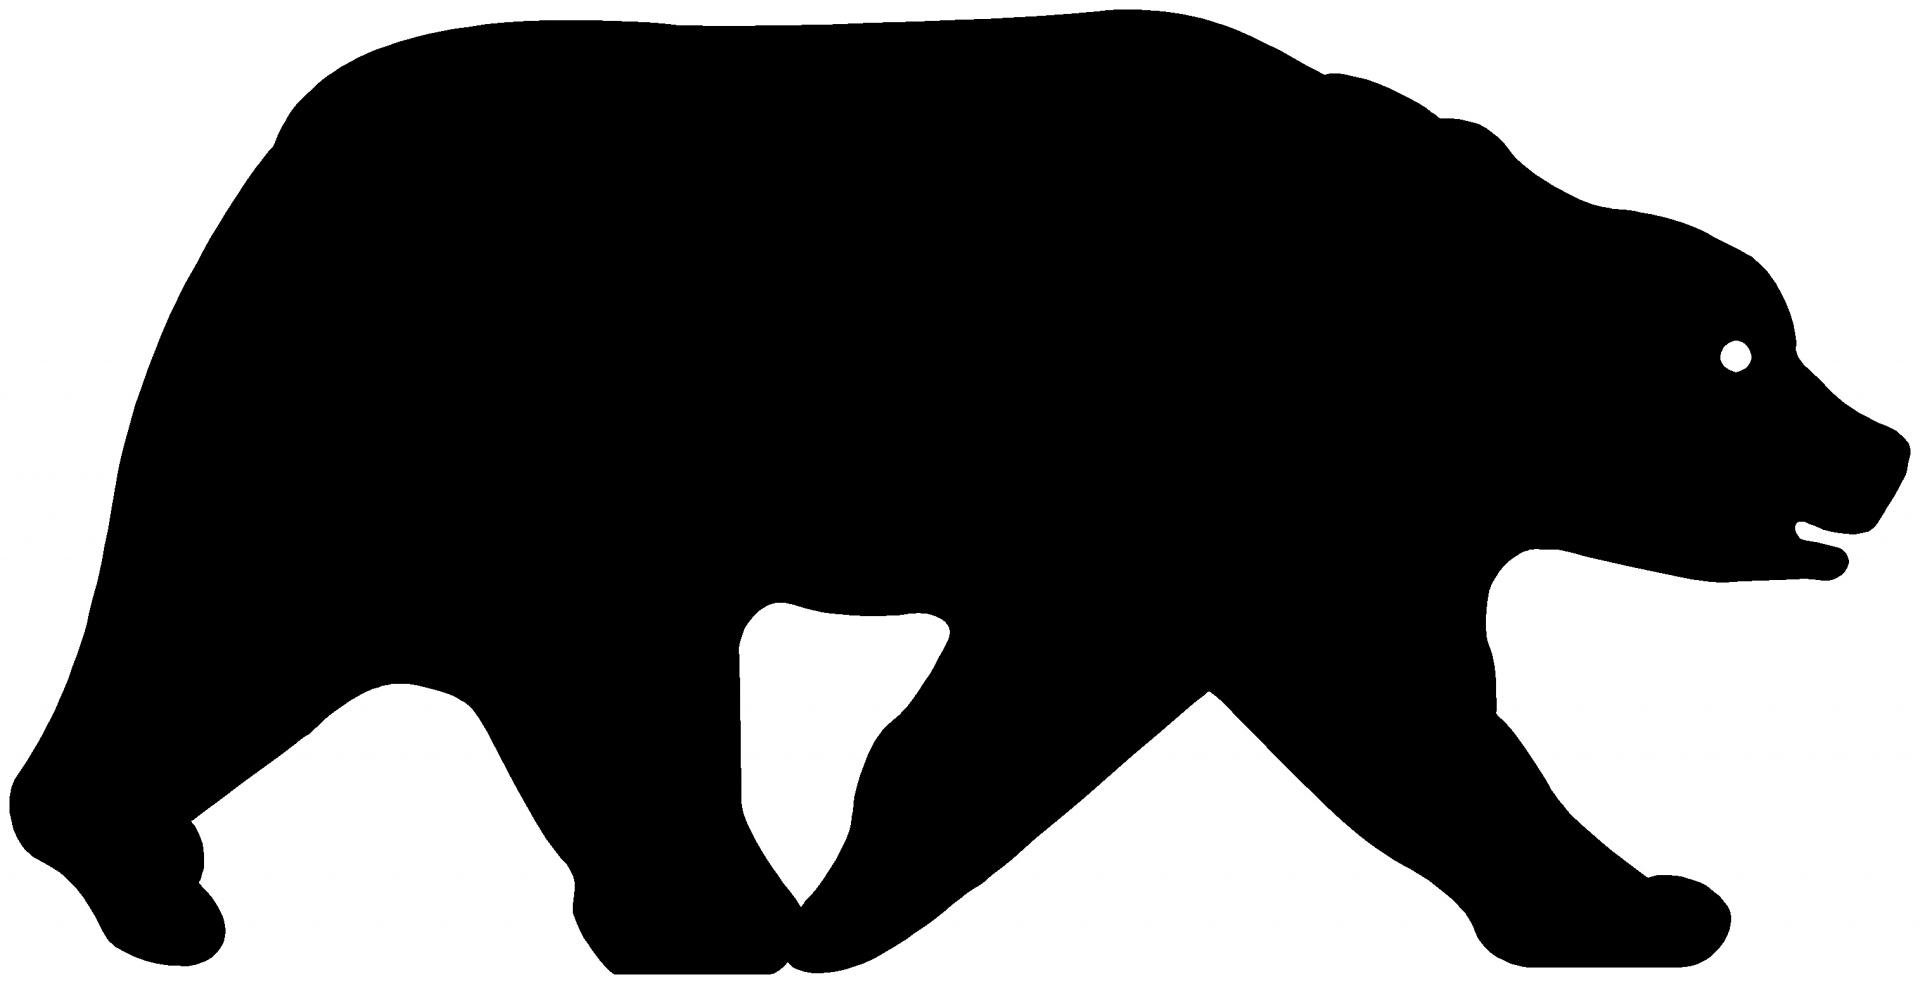 1920x984 Silhouette Of An Animal Free Stock Photo